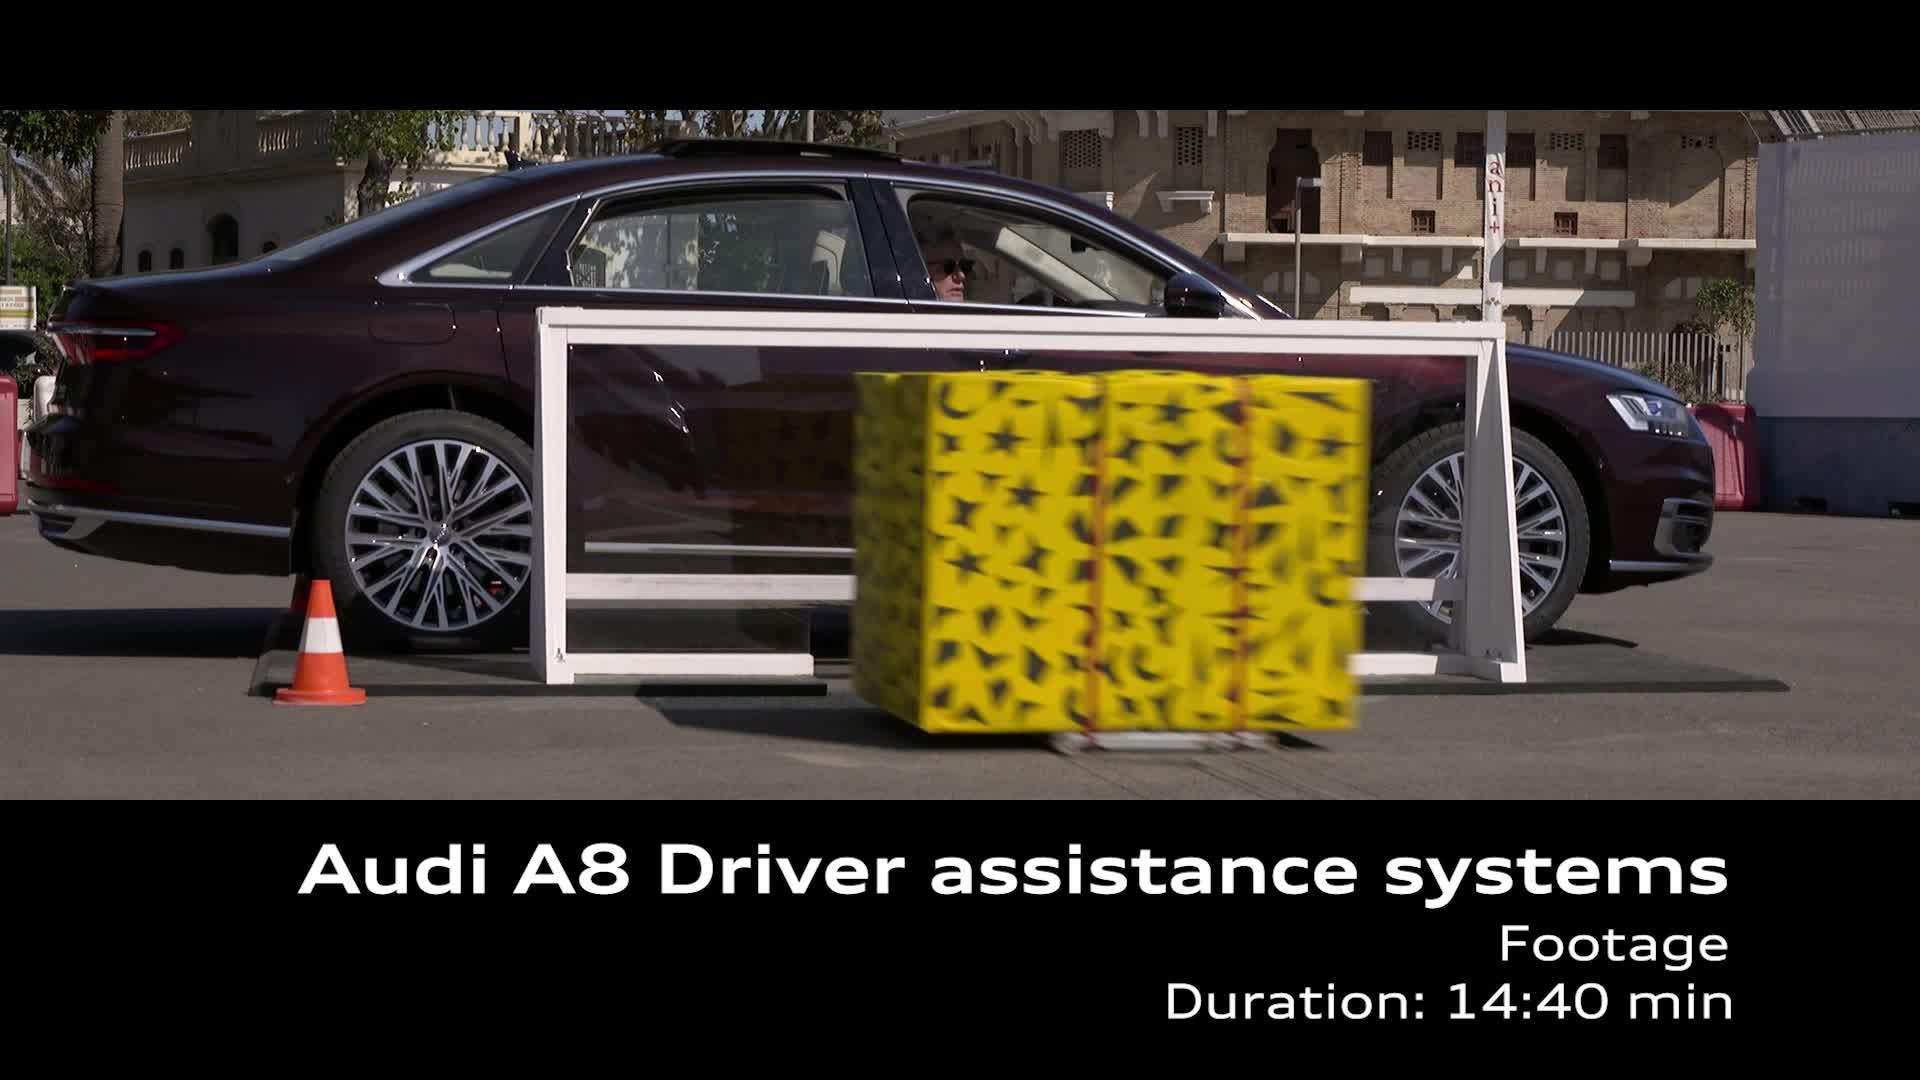 Footage Audi A8 Fahrerassistenzsysteme